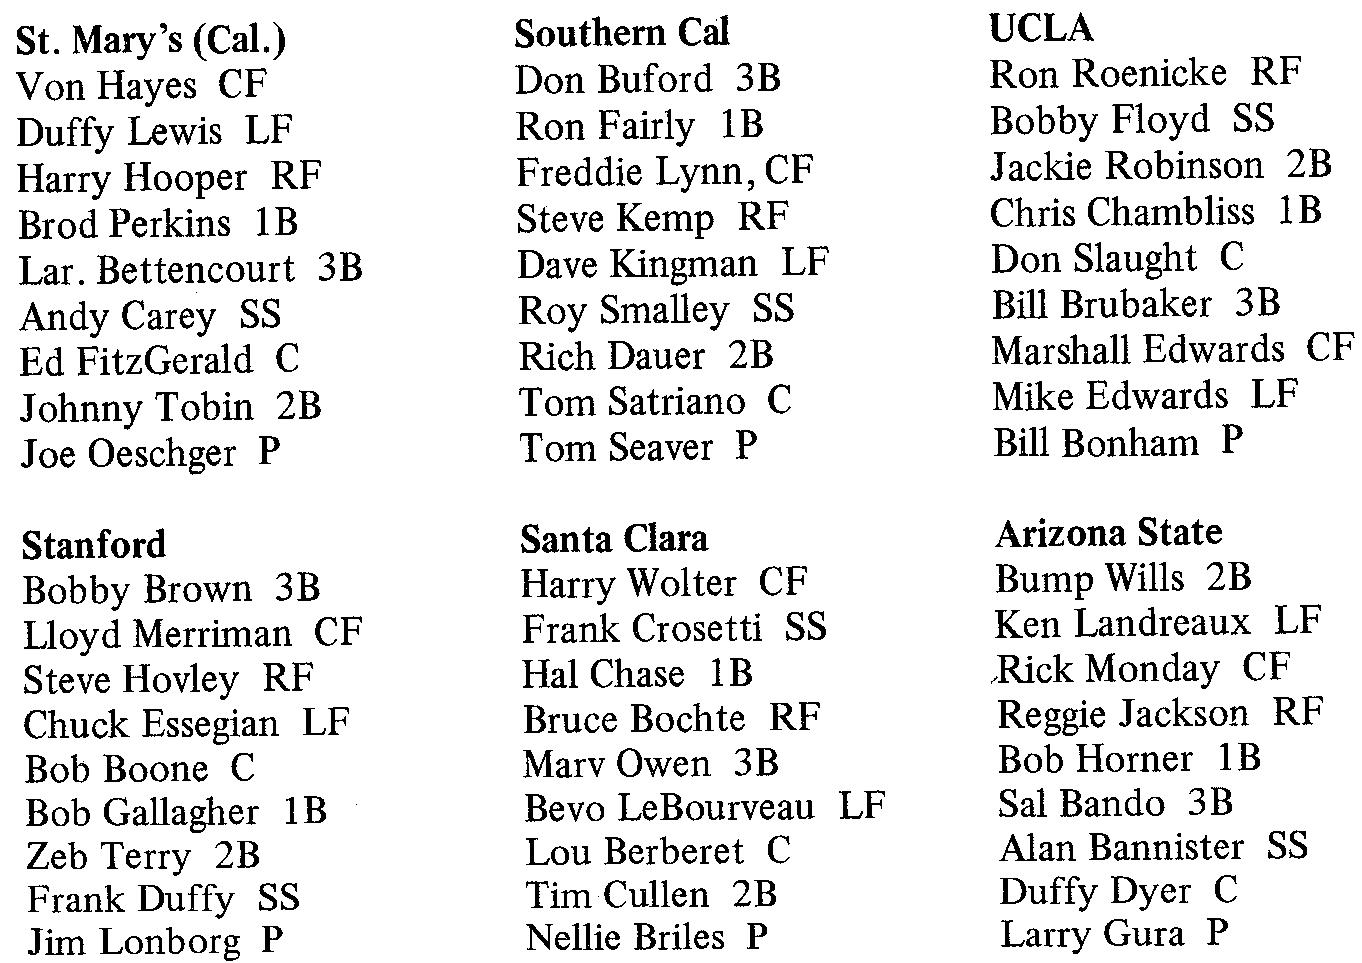 All-Time College Teams #1 (DAVID K. ANDERSON)